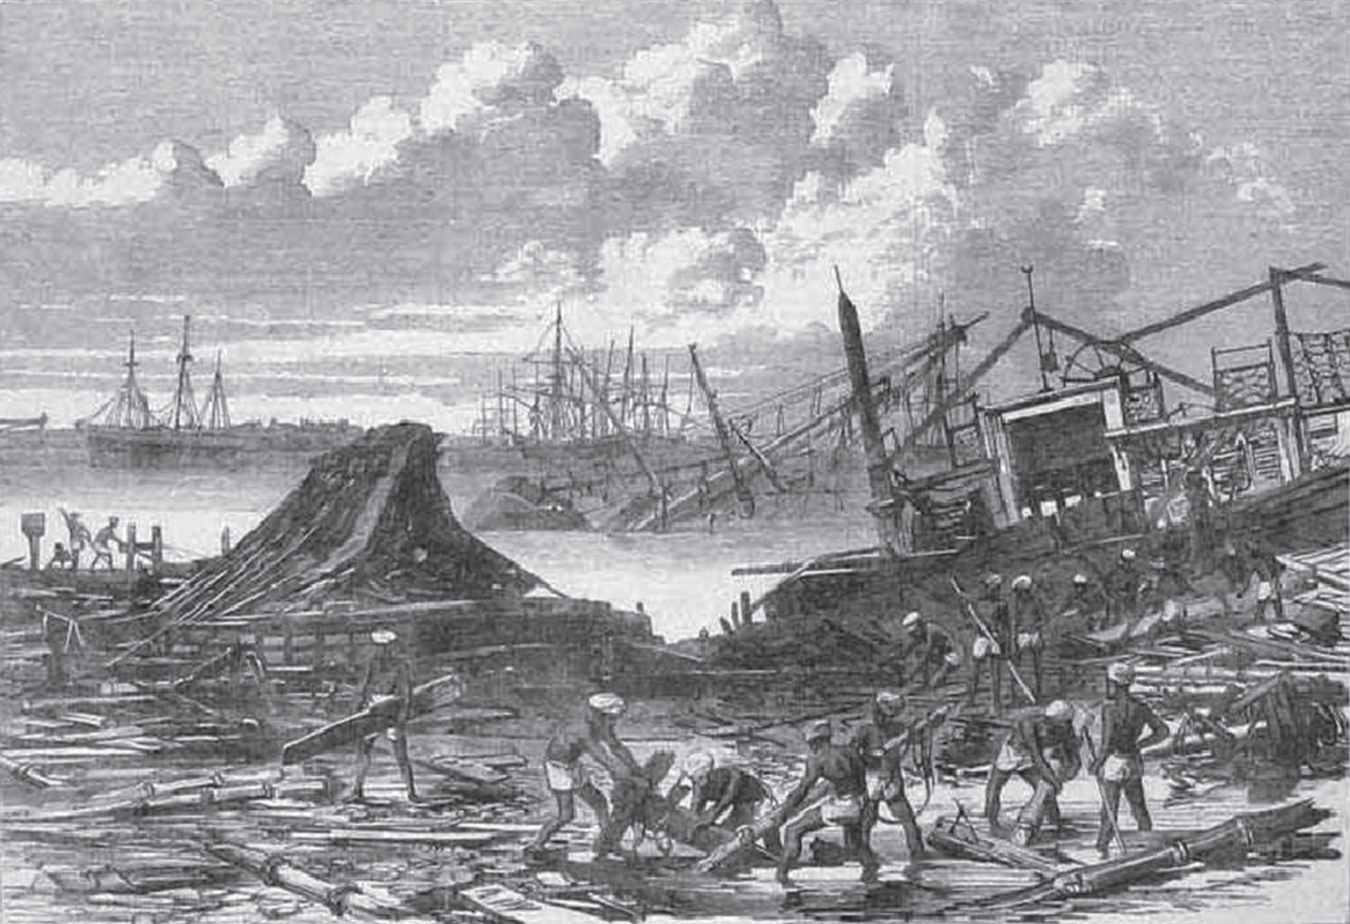 The devastation of the Calcutta Cyclone